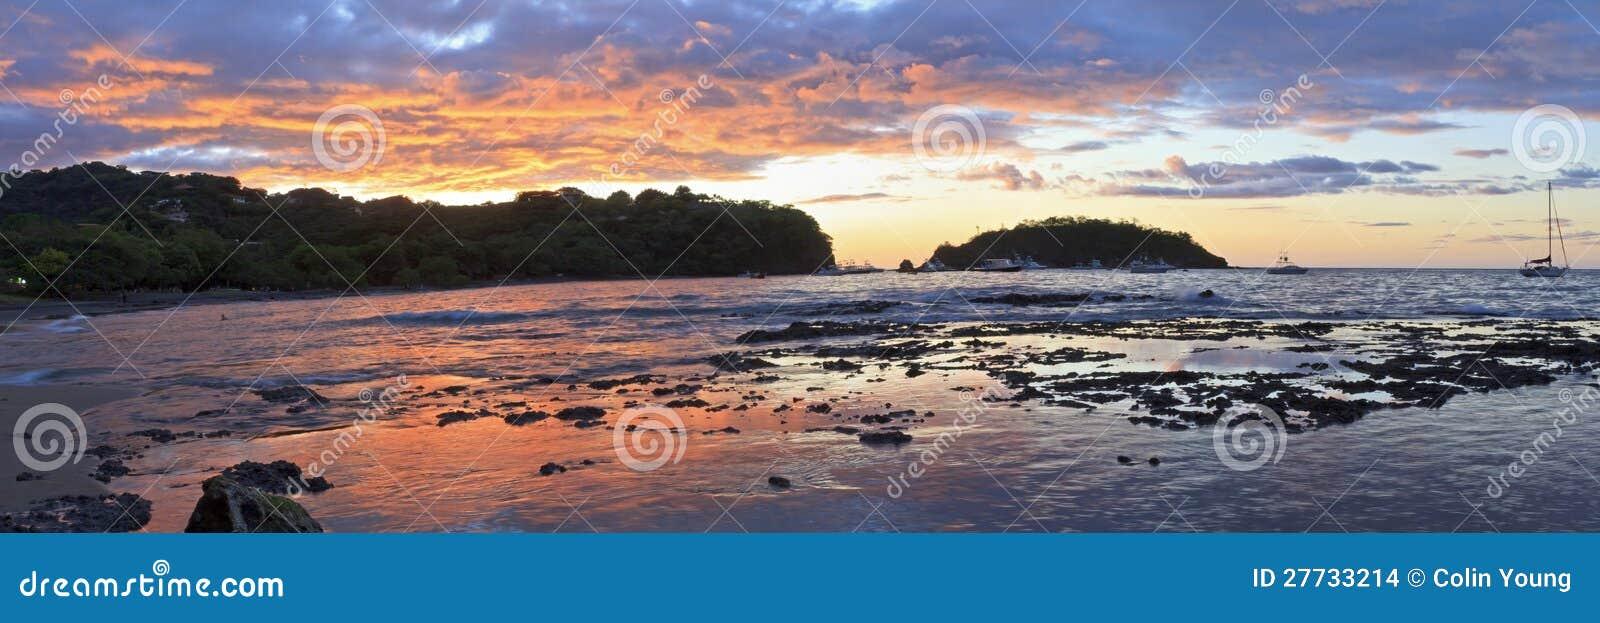 Ocotal Sonnenuntergang-Panorama